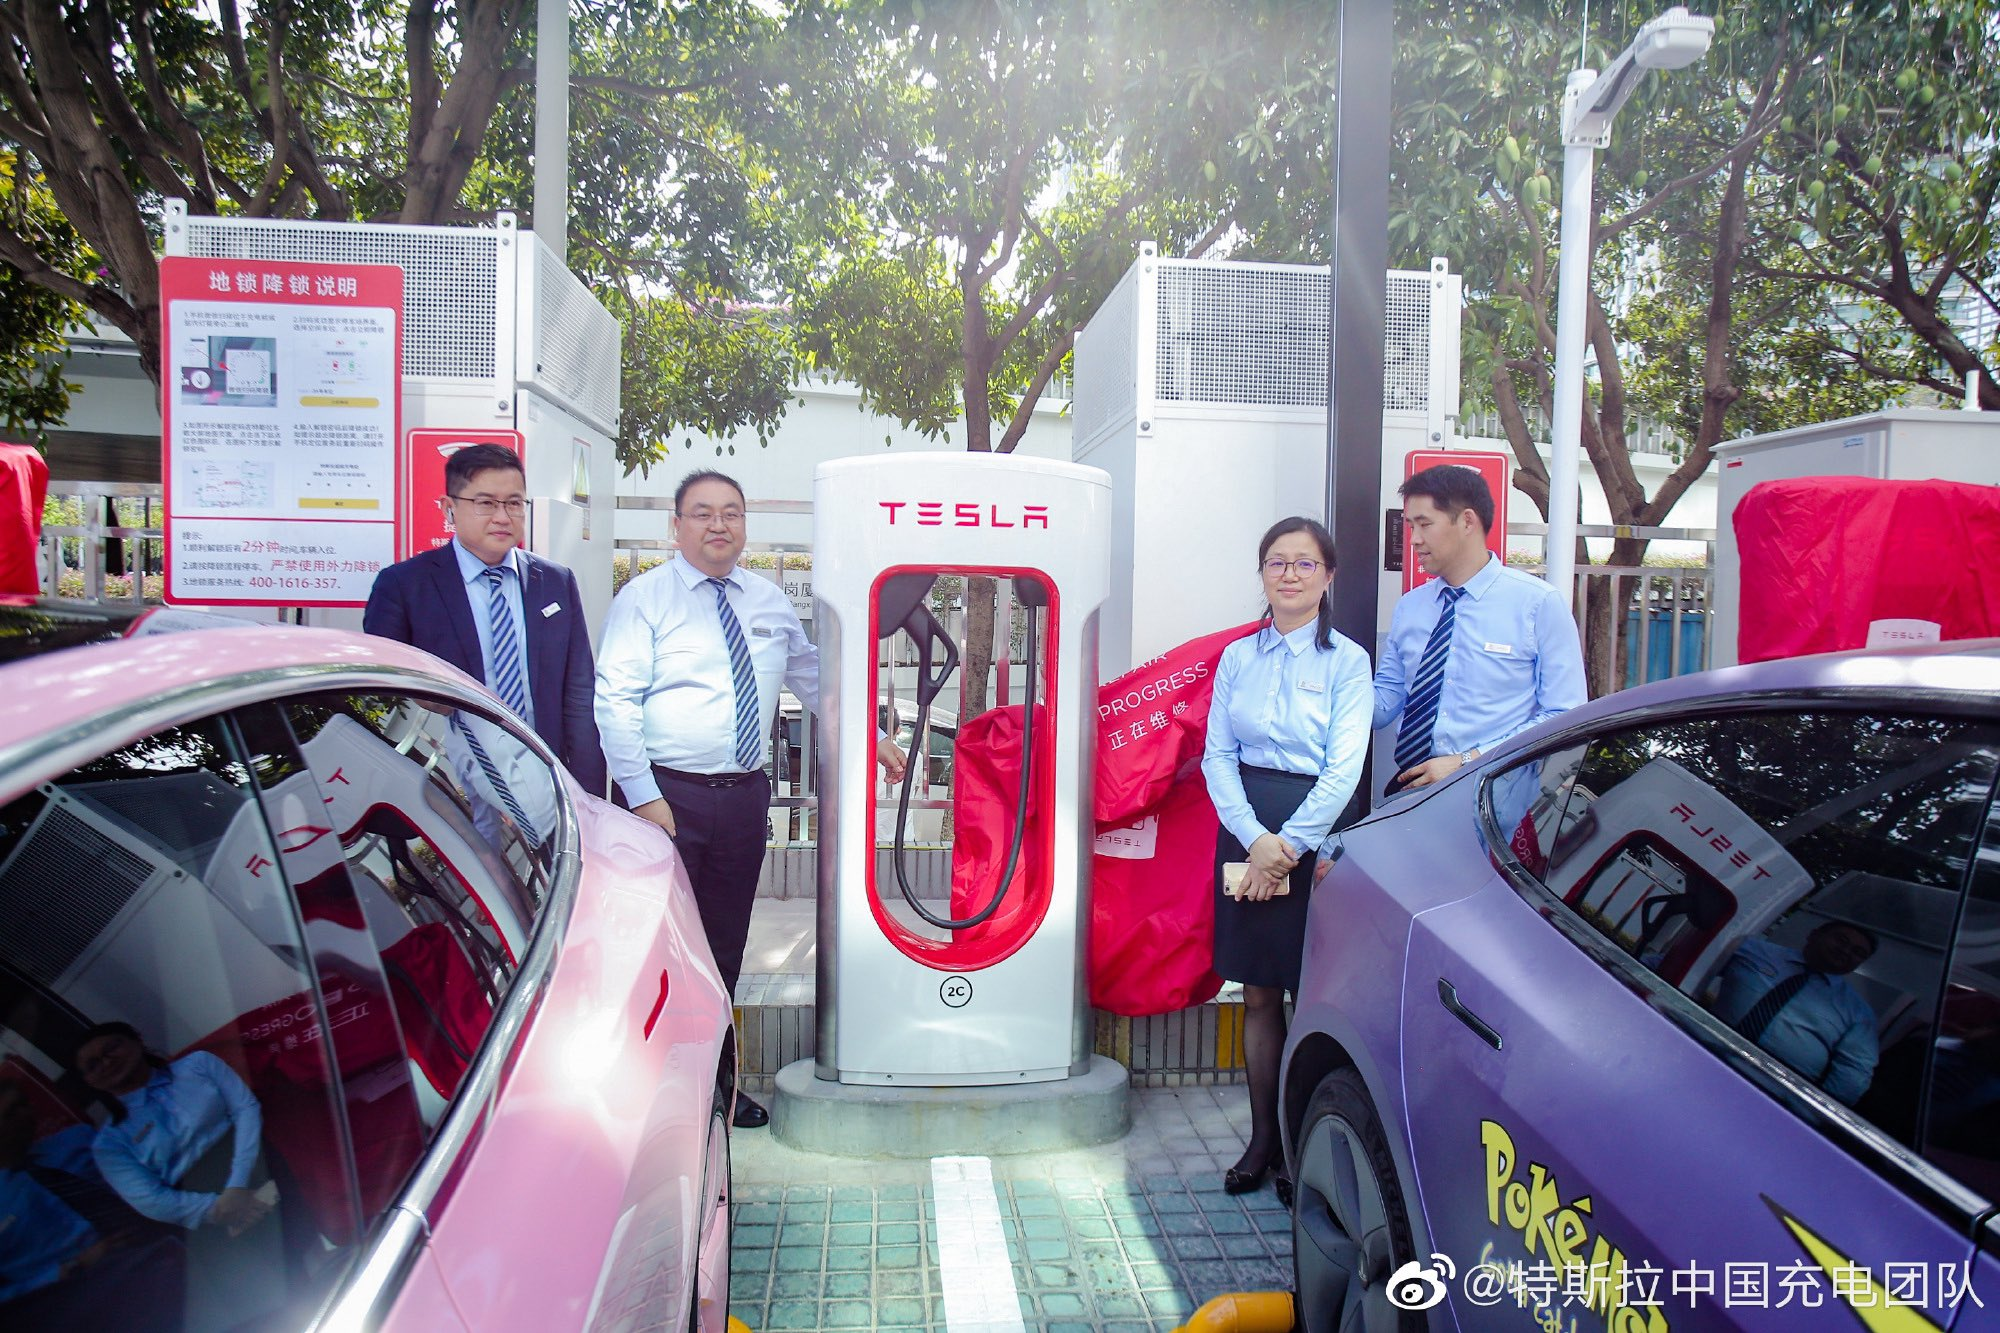 tesla-china-v-3-supercharger-from-gigafactory-shanghai